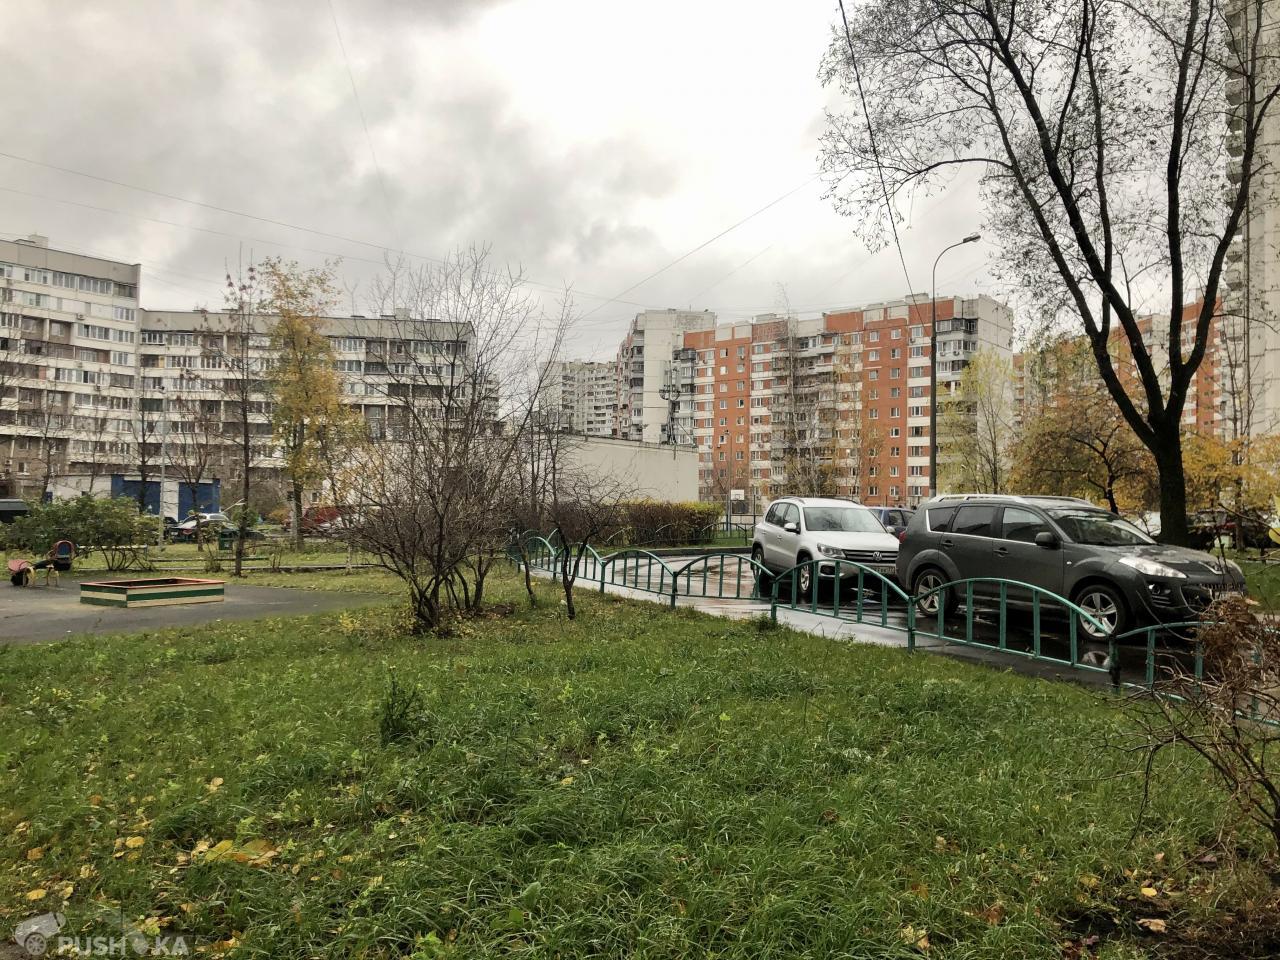 Продаётся 1-комнатная квартира 38.2 кв.м. этаж 3/22 за 7 750 000 руб